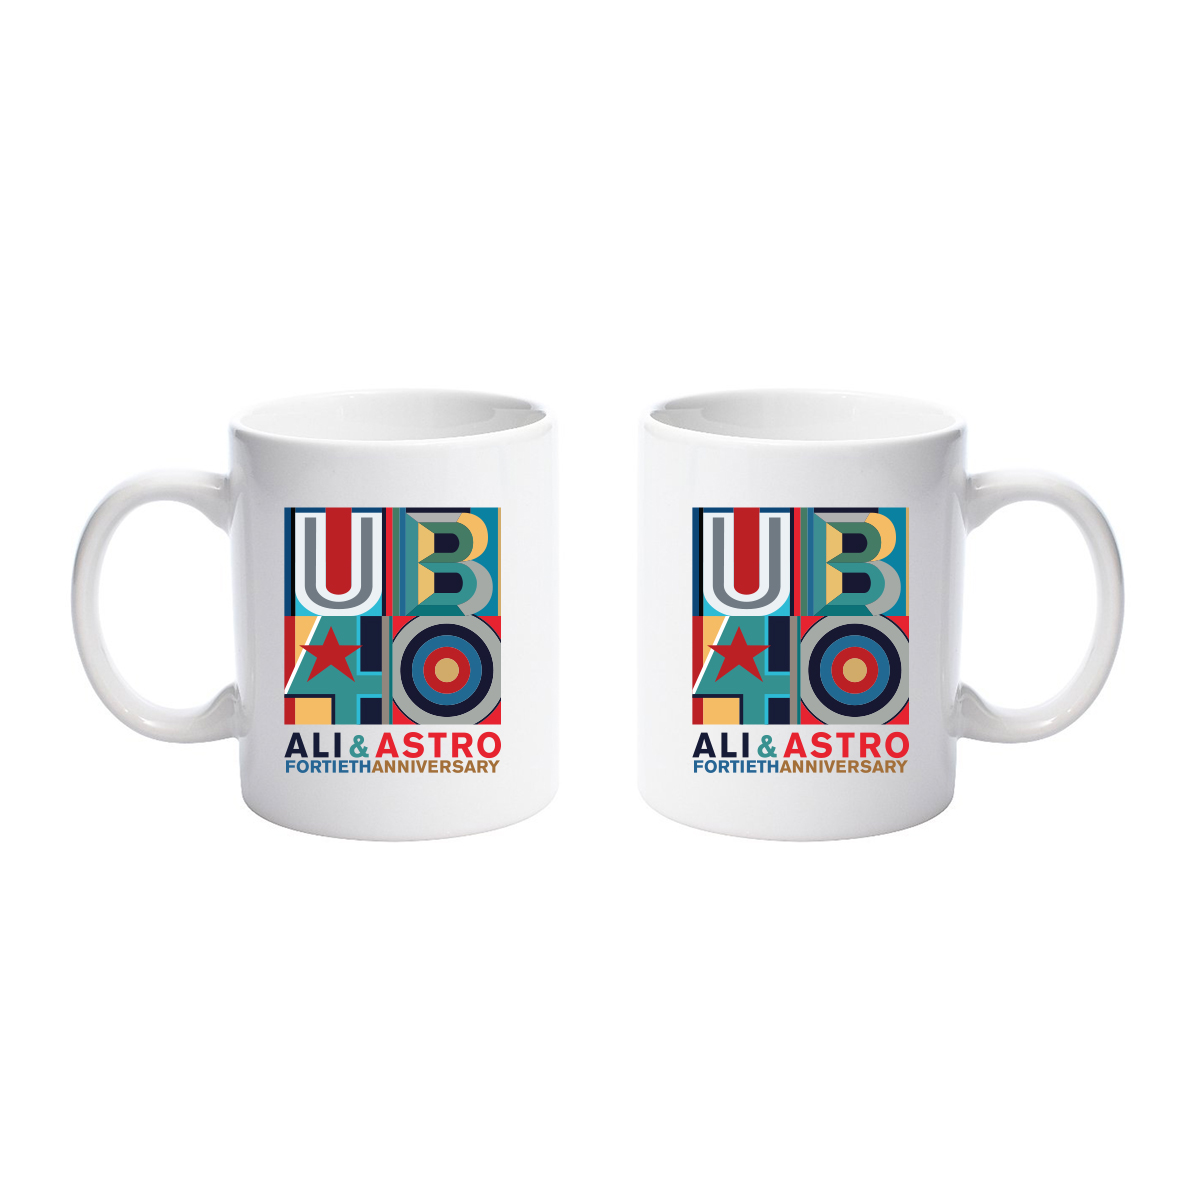 Ali & Astro Fortieth Anniversary White Mug - UB40